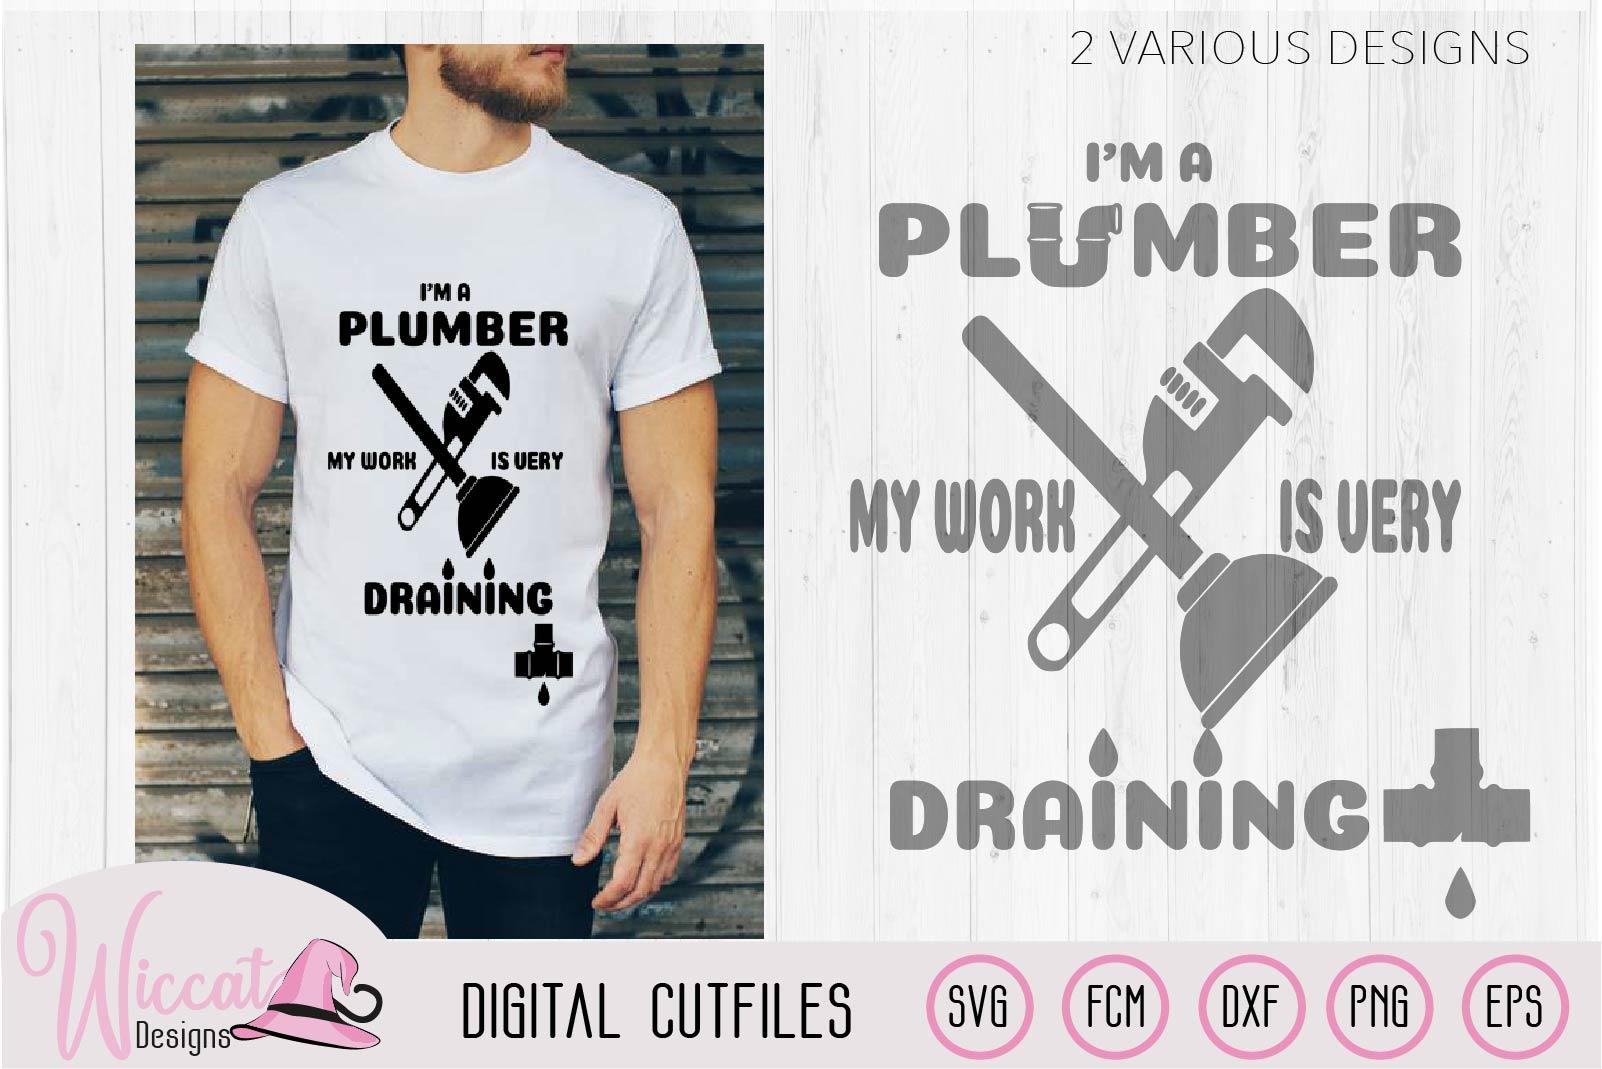 I'm a plumber quote, Plumber pun, plumber tools, man shirt, example image 2